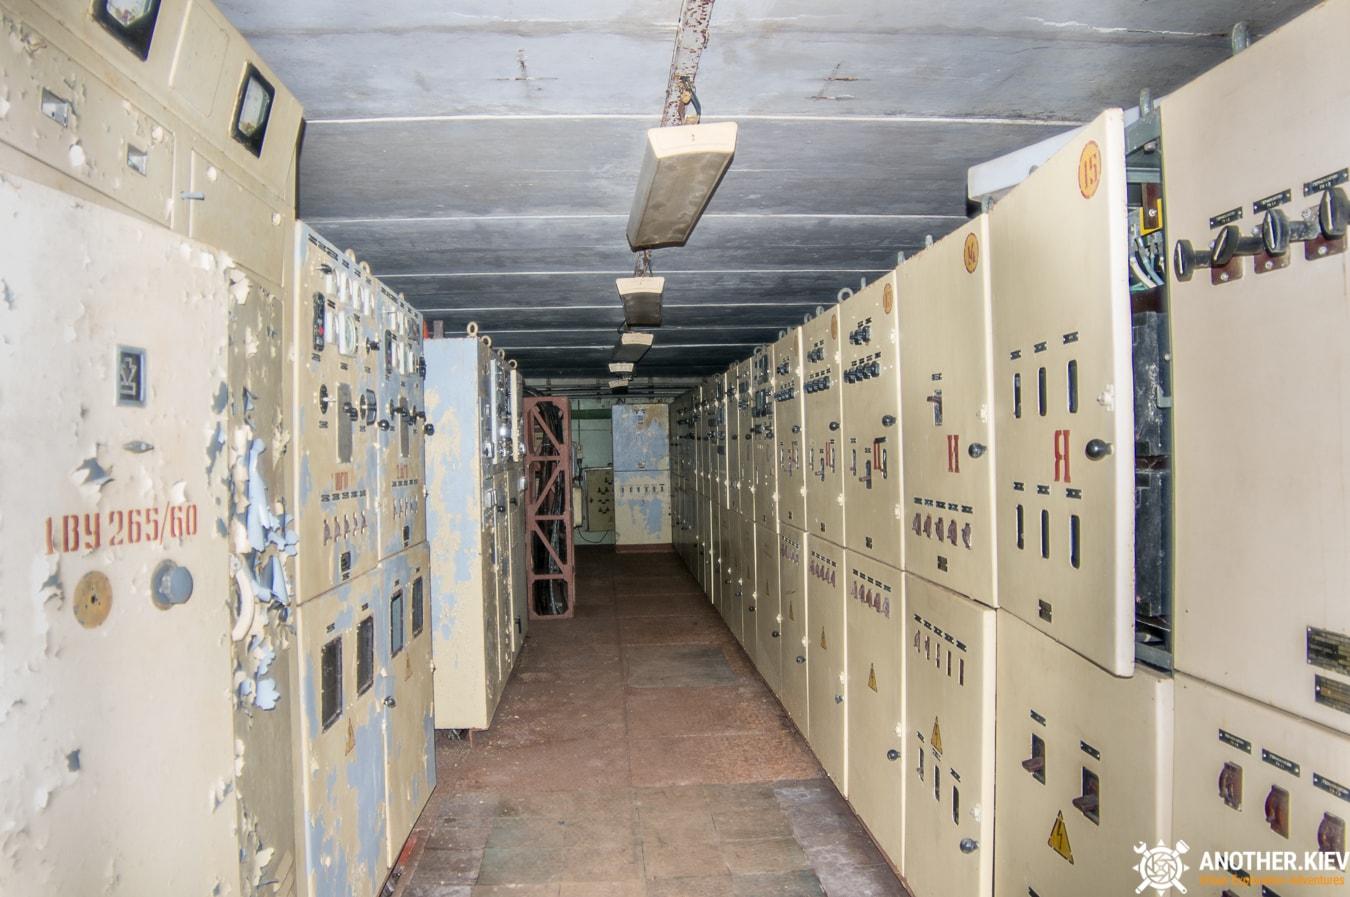 exploring-nuclear-bunker-duga-33 HIDDEN CHERNOBYL: EXPLORING NUCLEAR BUNKER  OF DUGA-3 RADAR STATION